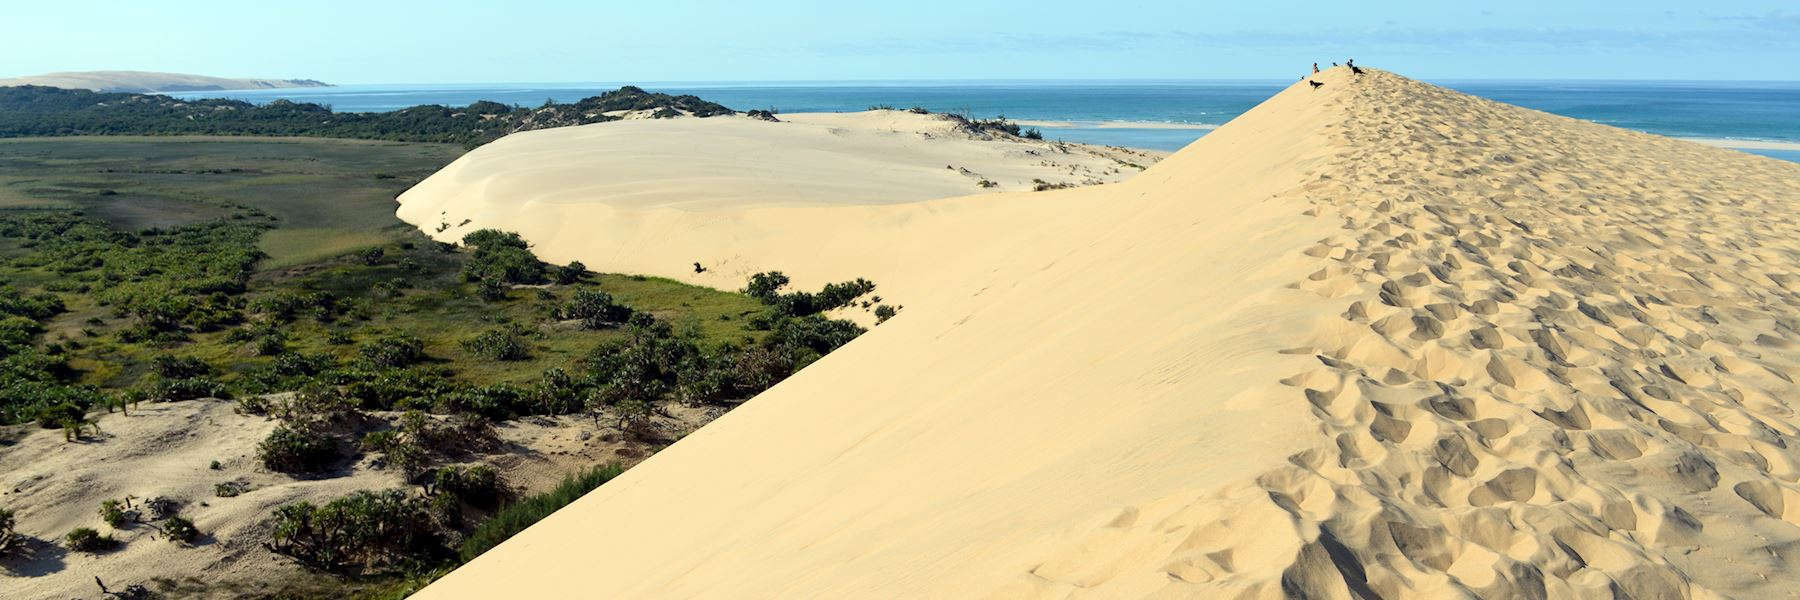 Mozambique holidays & safaris